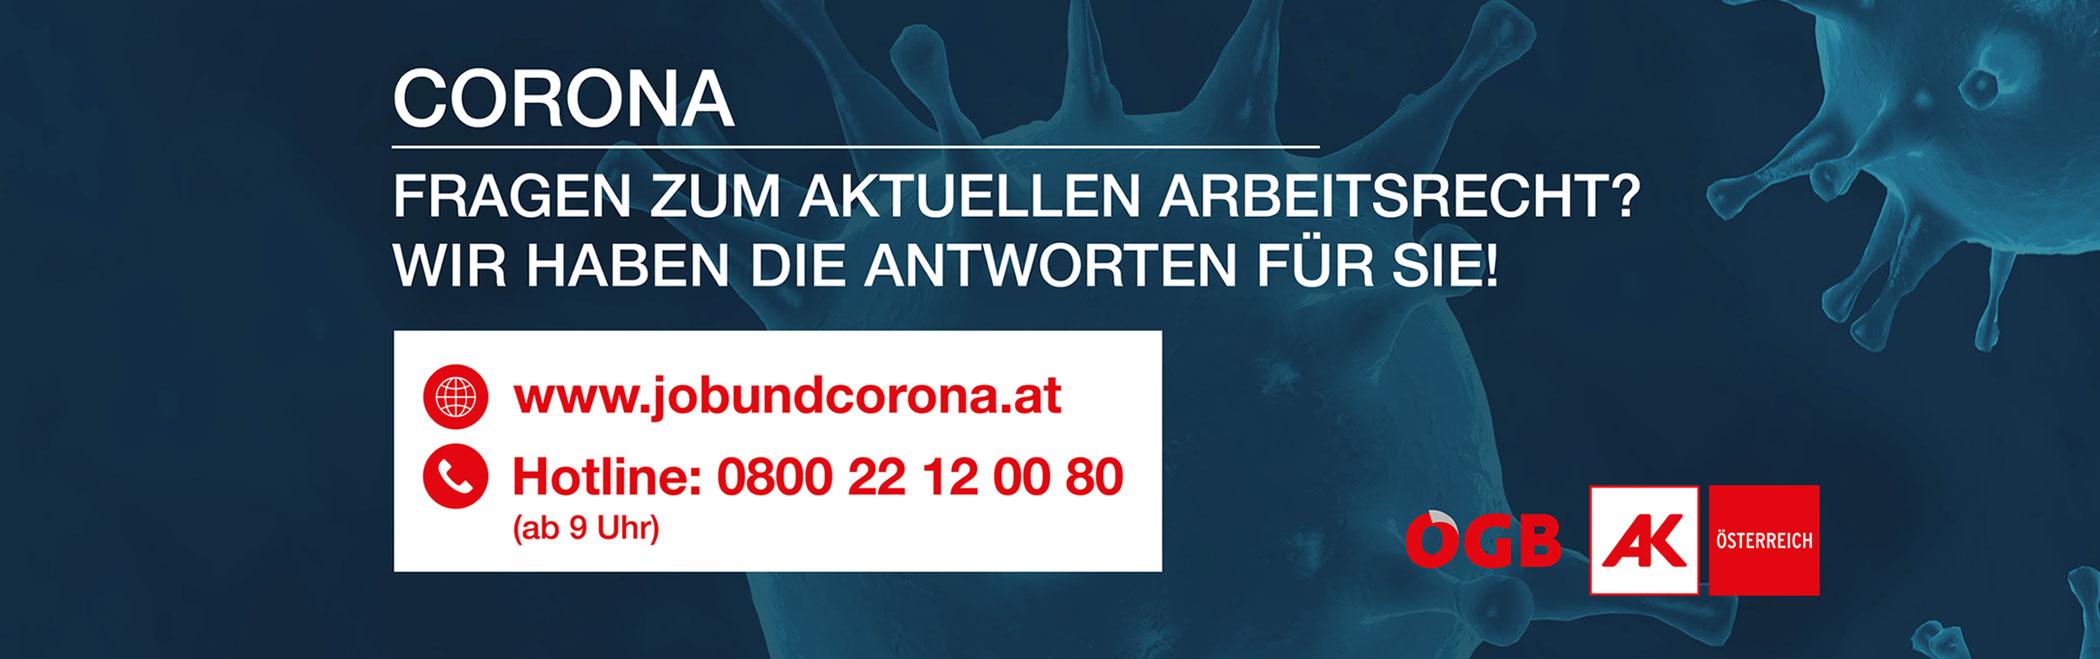 fsg-corona-hotline-slider